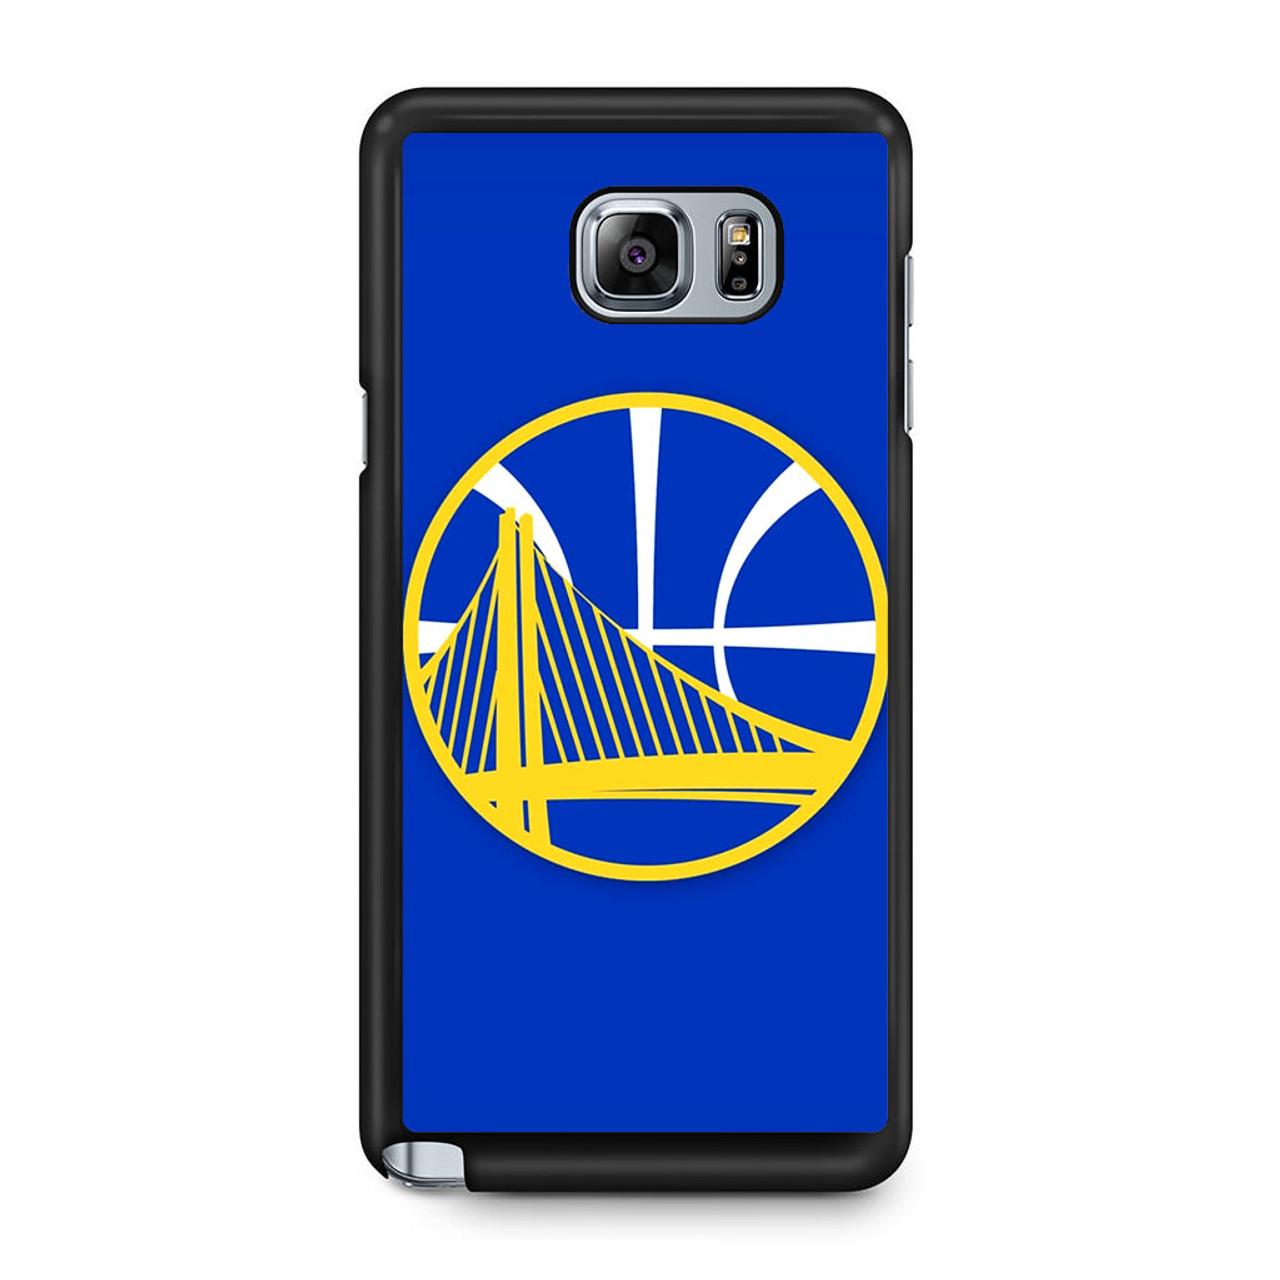 Golden State Warriors Logo Nba Samsung Galaxy Note 5 Case - CASESHUNTER